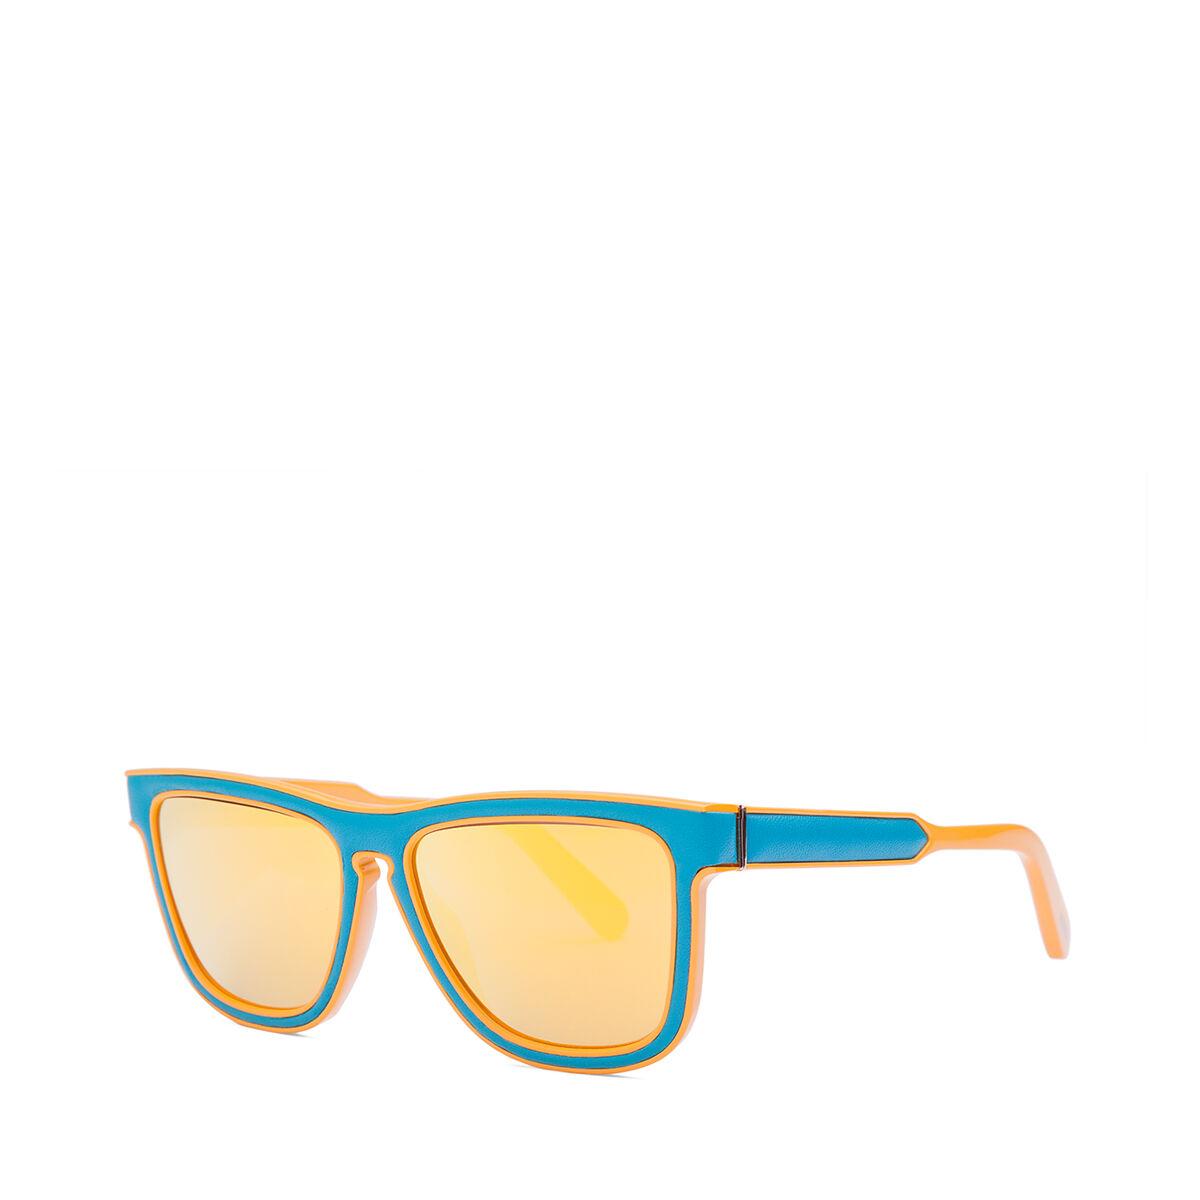 LOEWE Gafas Cuadradas Acolchadas Turquesa/Amarillo Espejo front